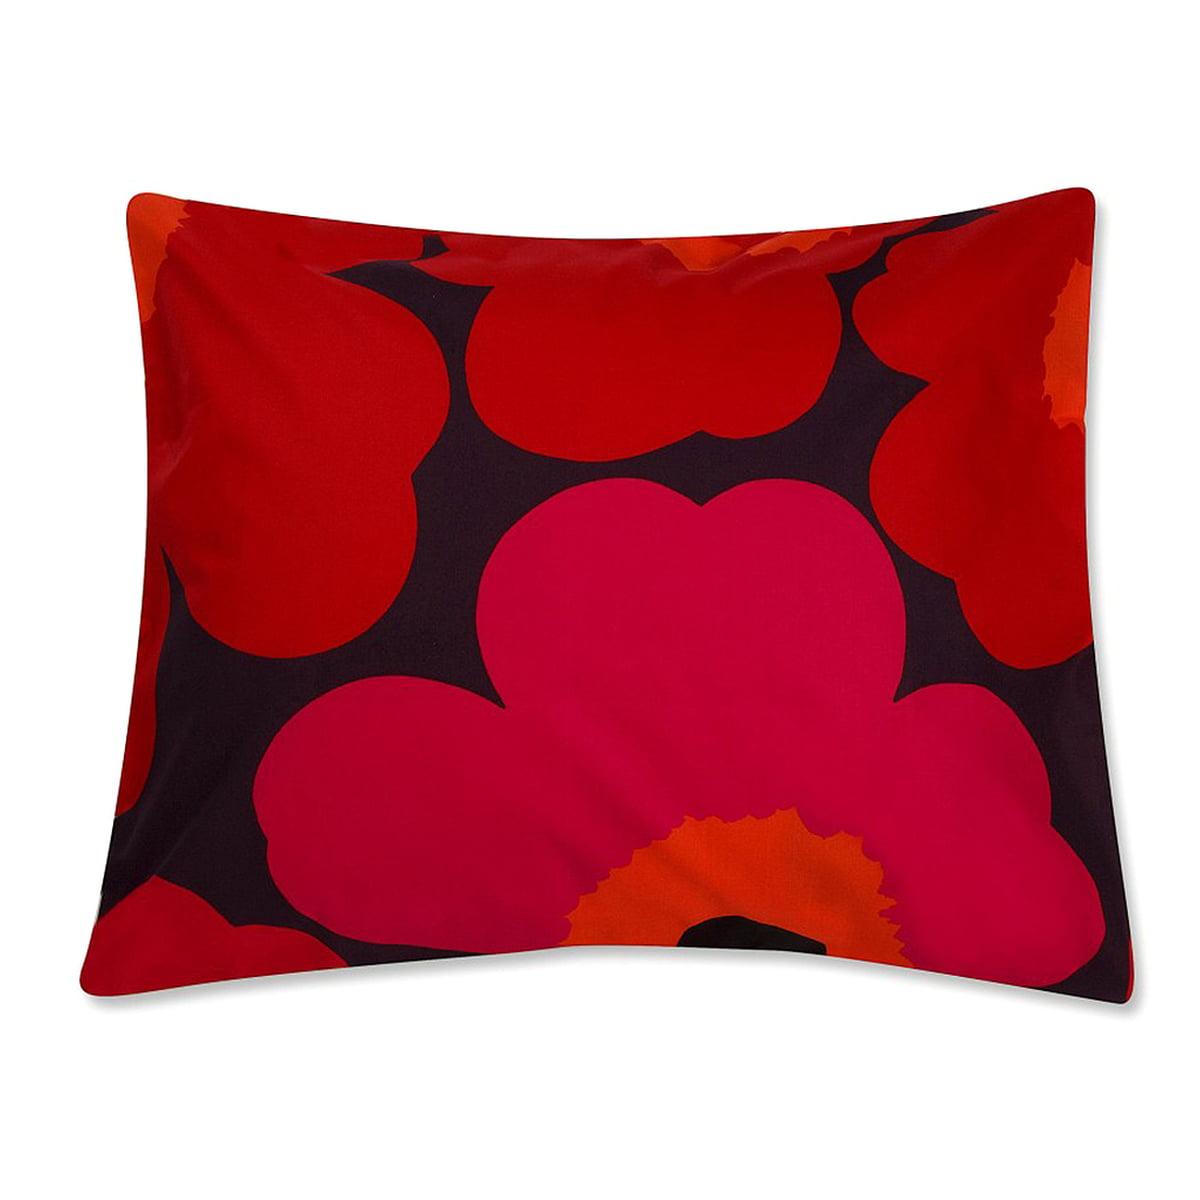 unikko kopfkissenbezug von marimekko connox. Black Bedroom Furniture Sets. Home Design Ideas